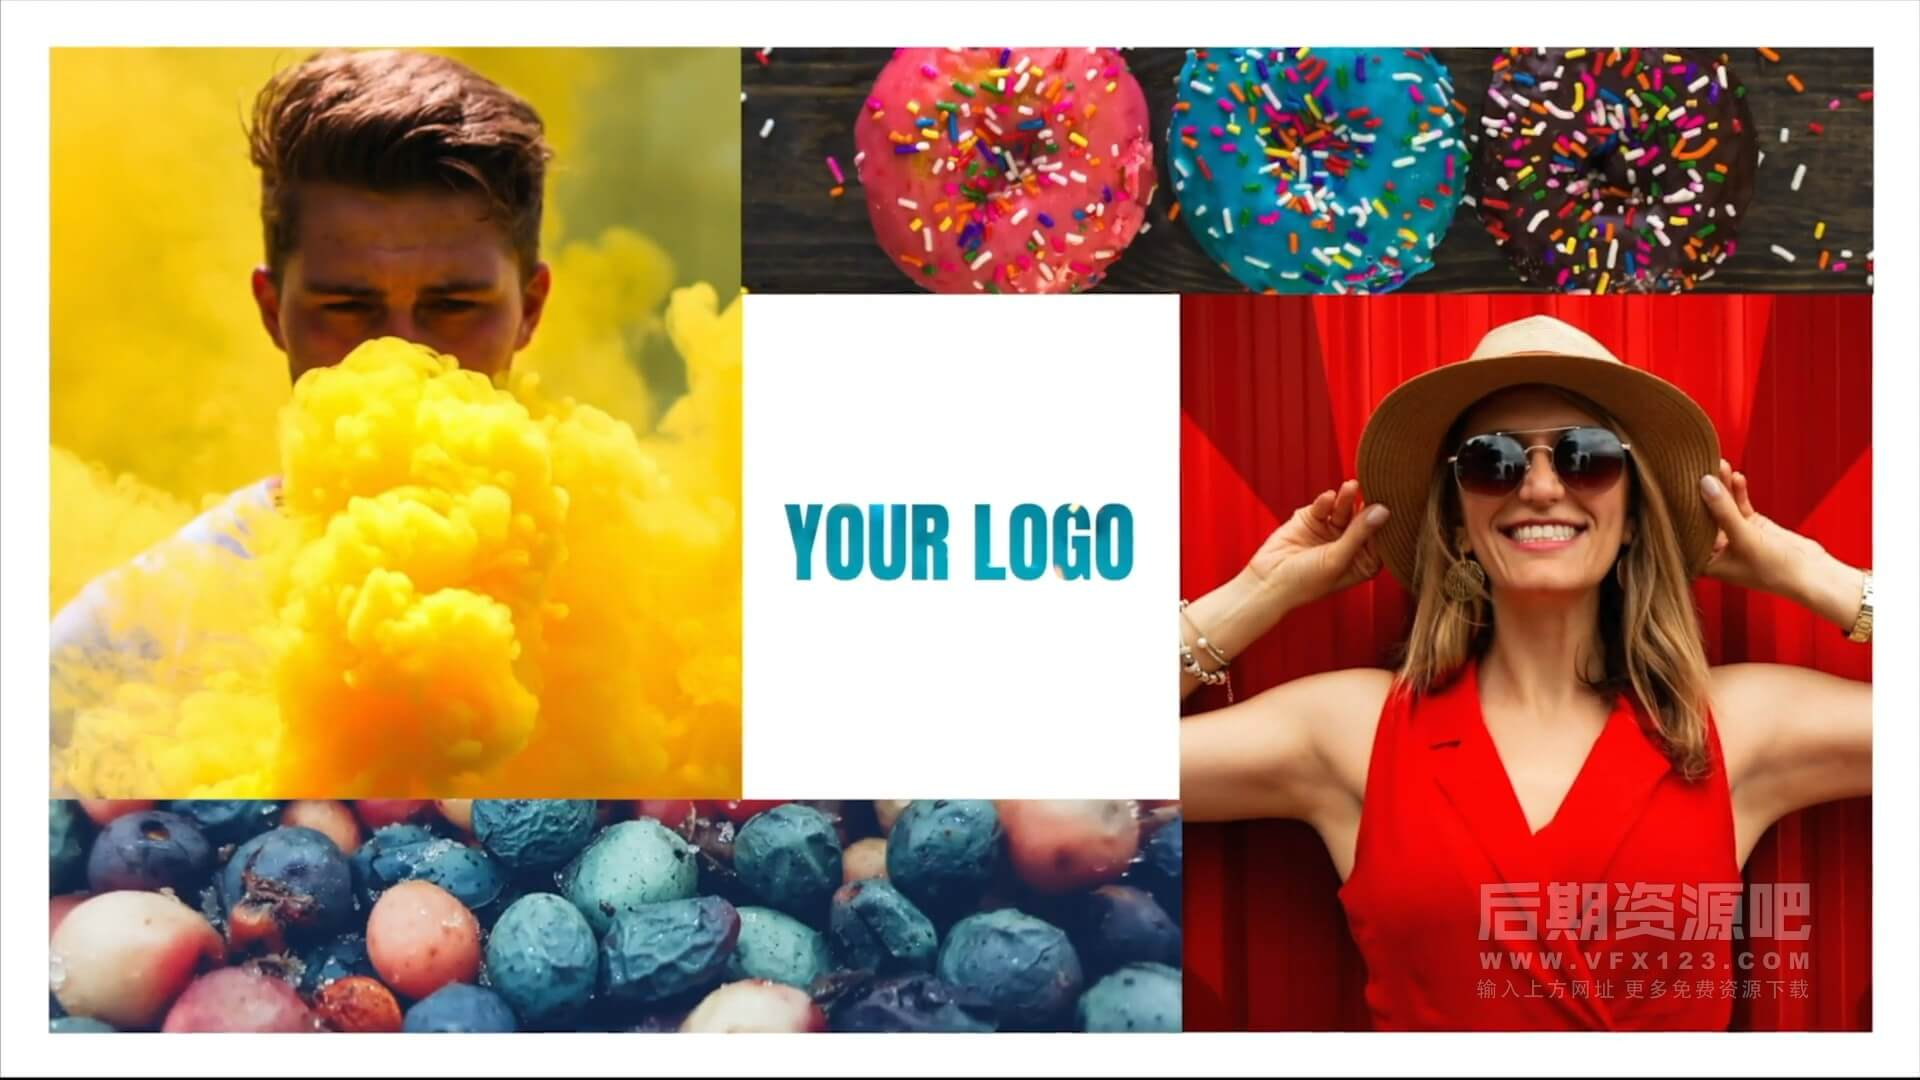 fcpx插件 10组照片拼接动画样式徽标LOGO展示片头模板 Photo Openers Logo Reveal